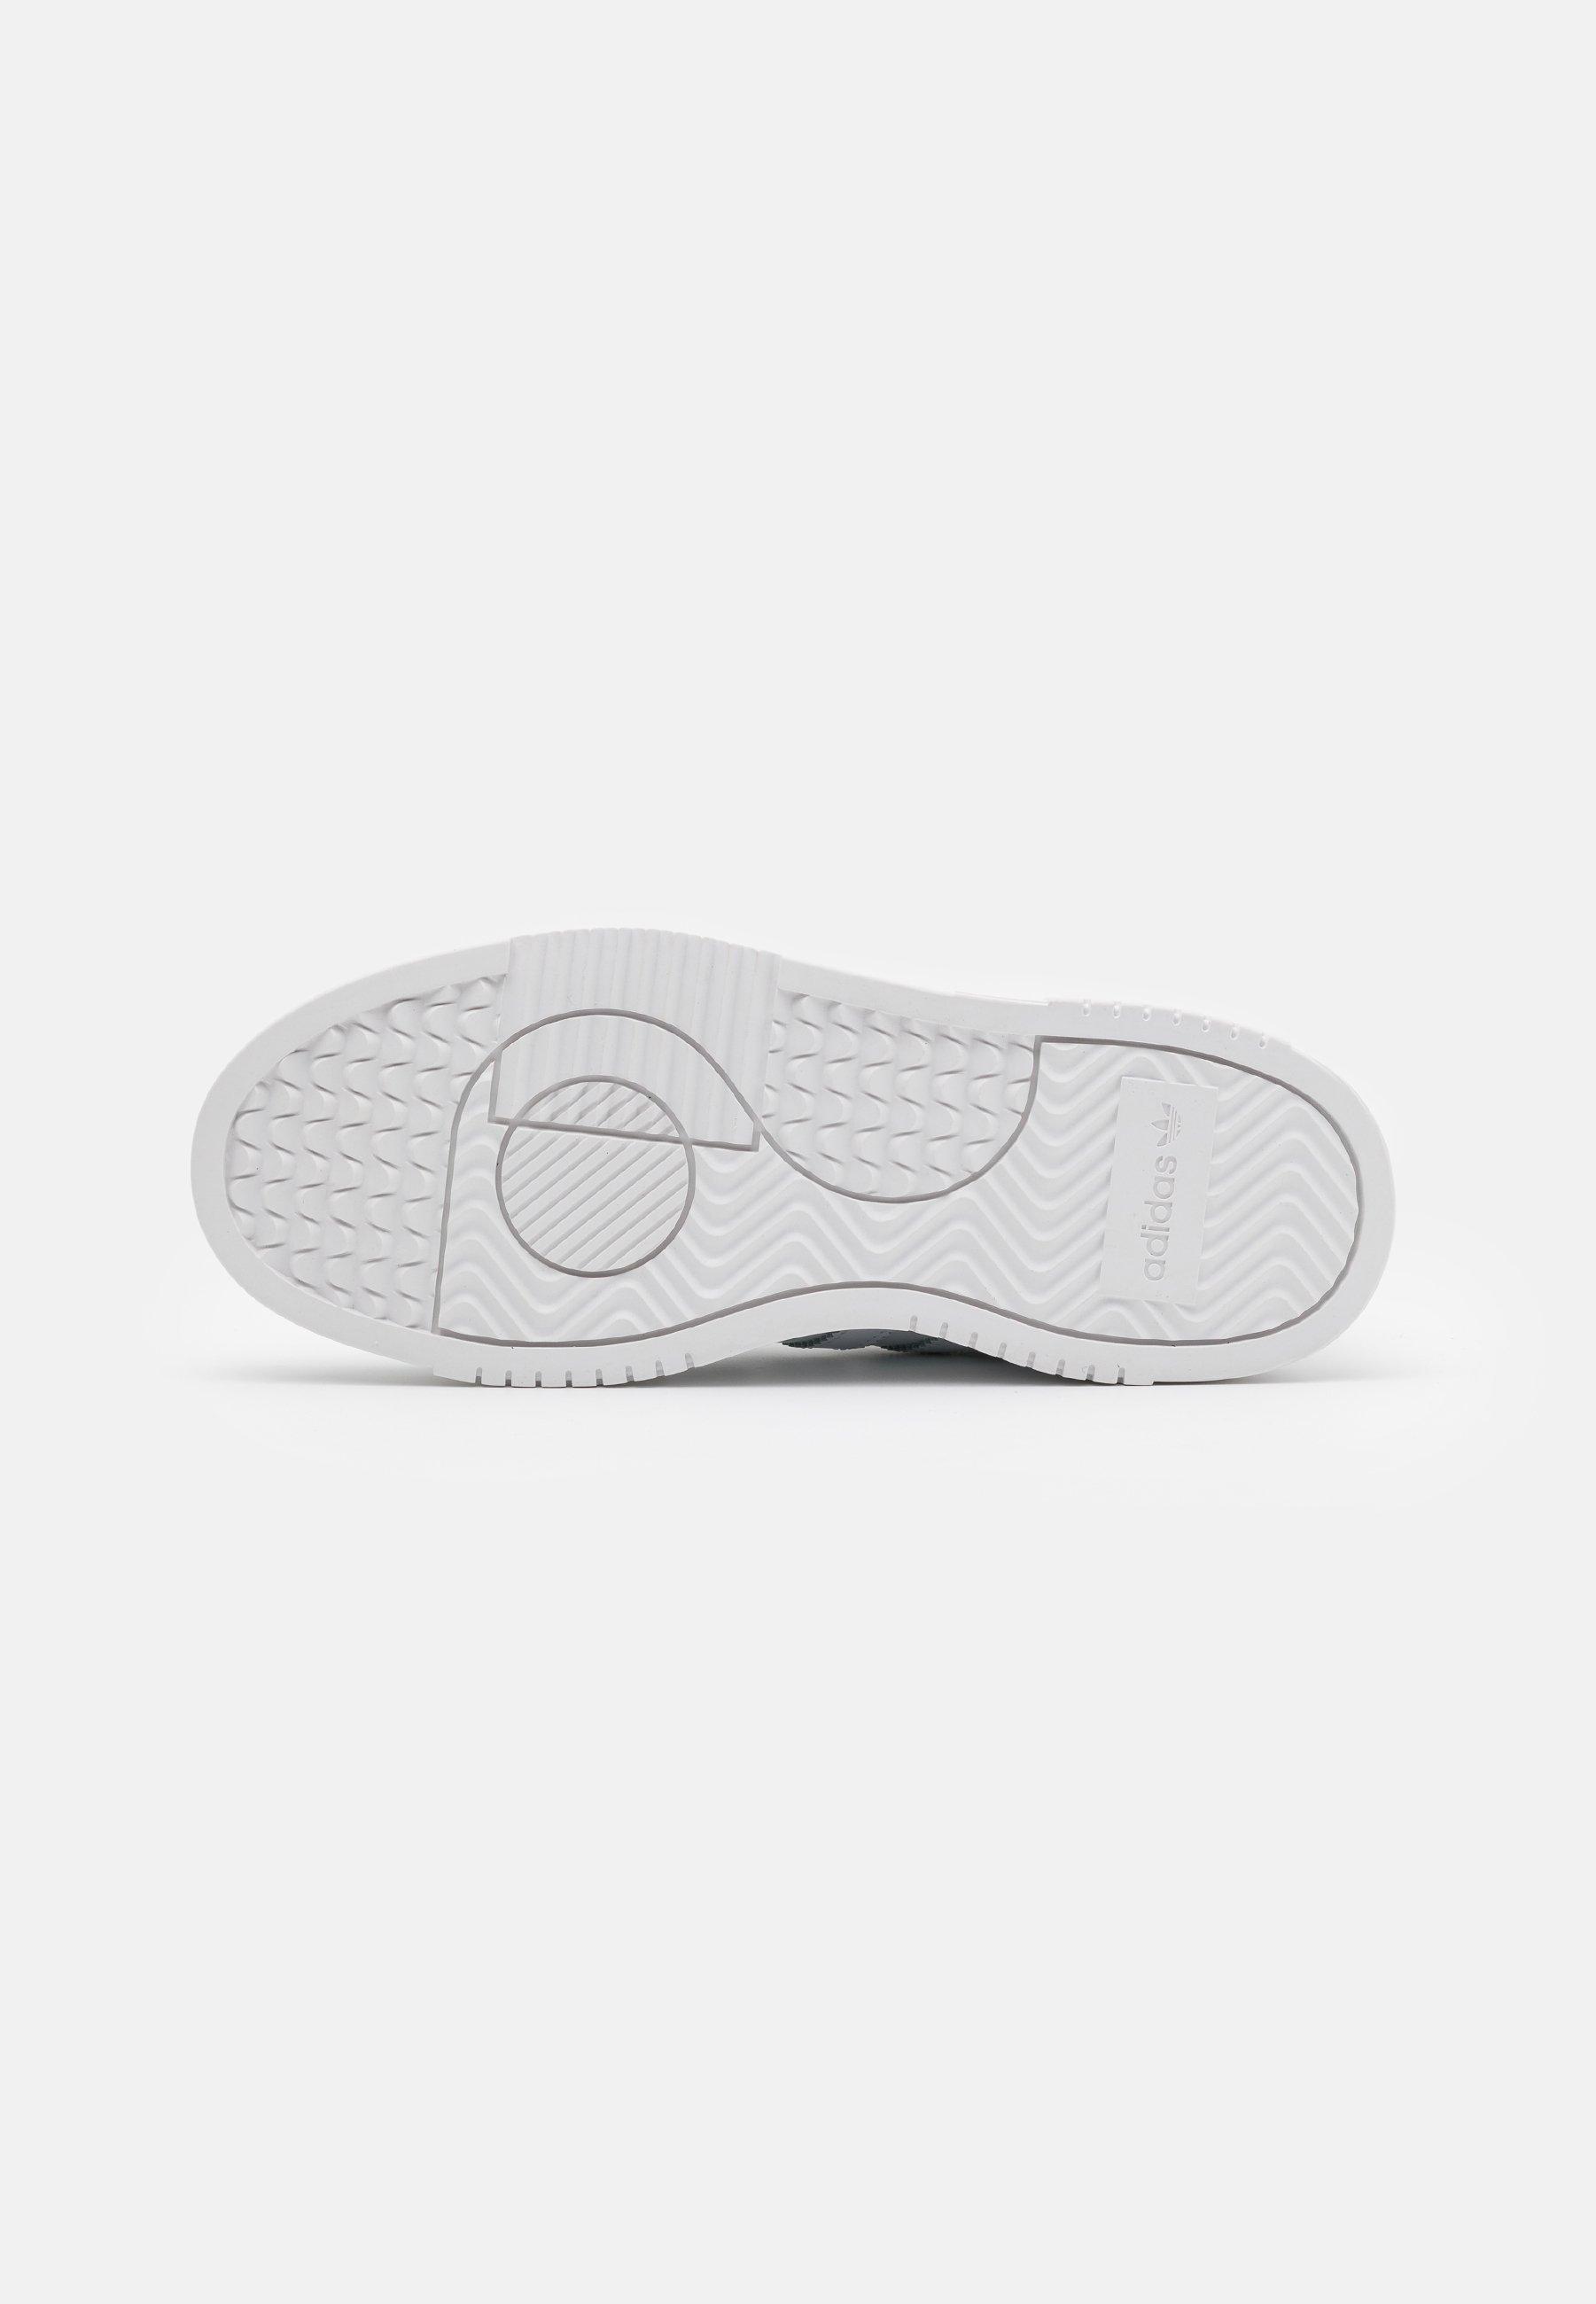 100% authentique Meilleurs prix adidas Originals SUPER COURT SPORTS INSPIRED SHOES Baskets basses footwear white/super coler OZi1e